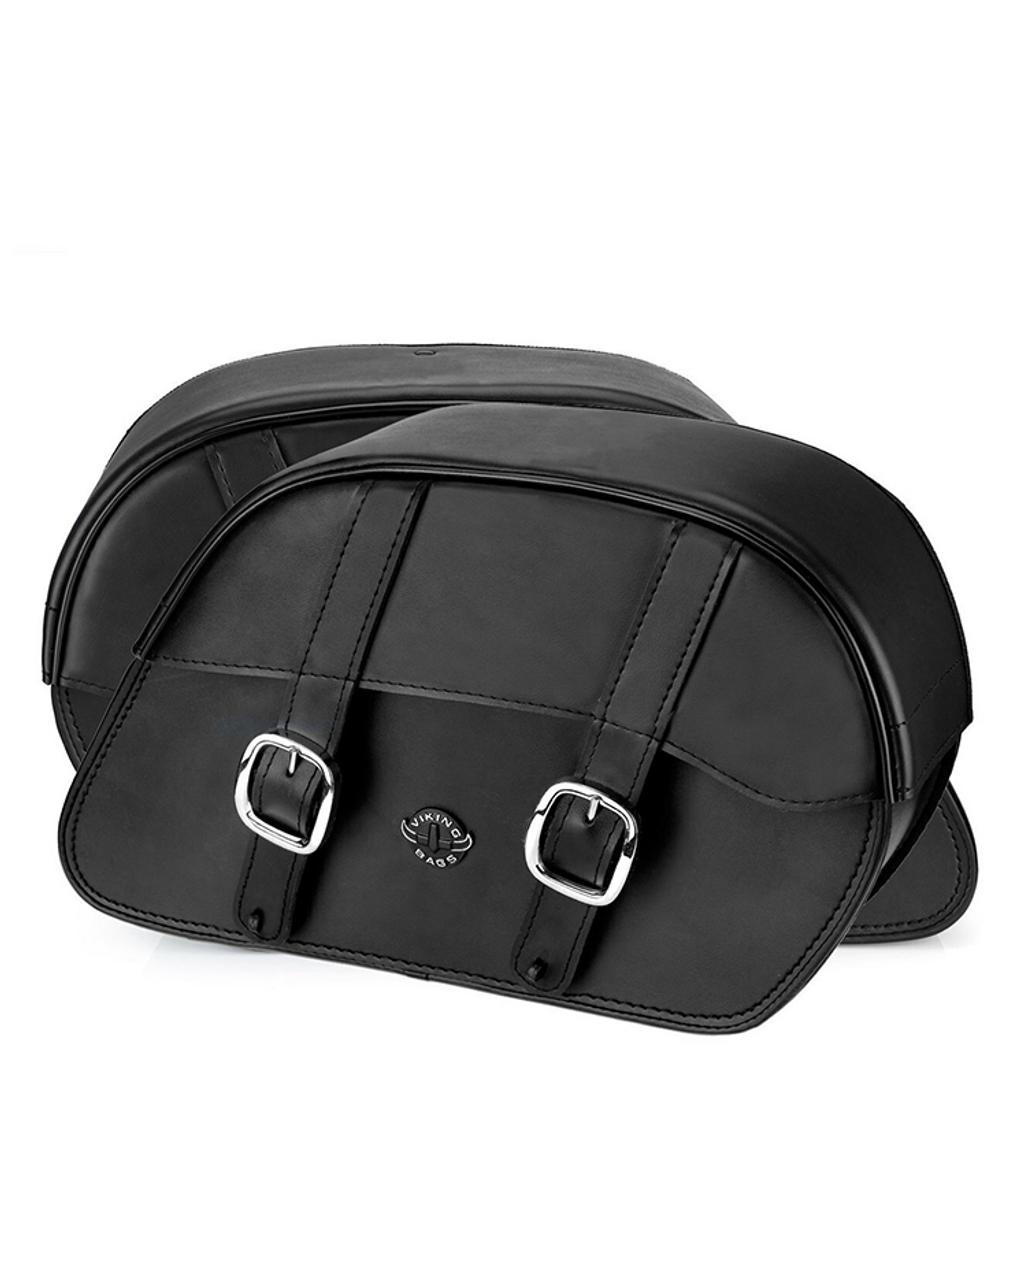 Viking Slanted Large Motorcycle Saddlebags For Harley Softail Standard FXST Both bag view